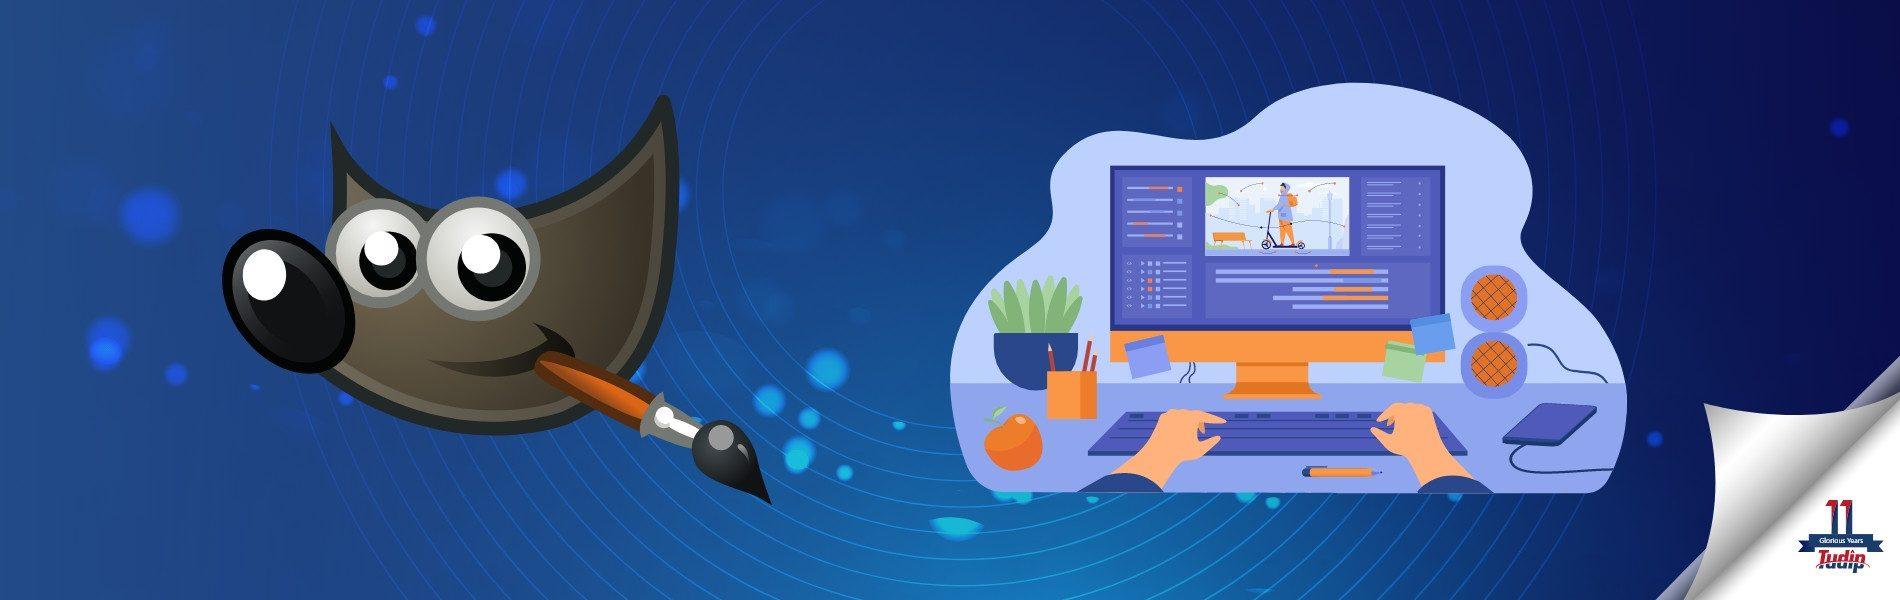 GNU manipulation tools installation and working